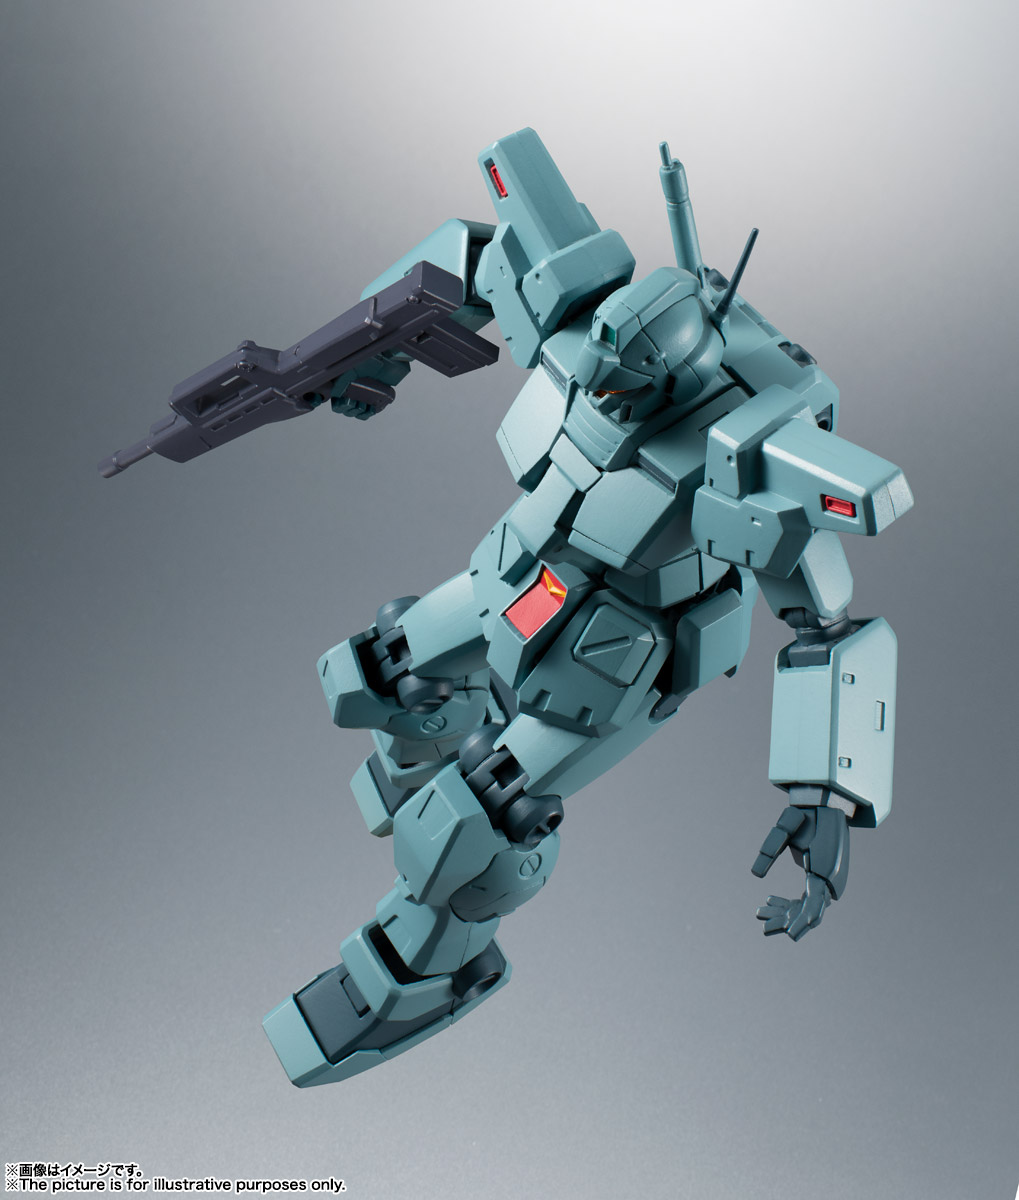 ROBOT魂〈SIDE MS〉『RGM-79N ジム・カスタム ver. A.N.I.M.E.』ガンダム0083 可動フィギュア-013